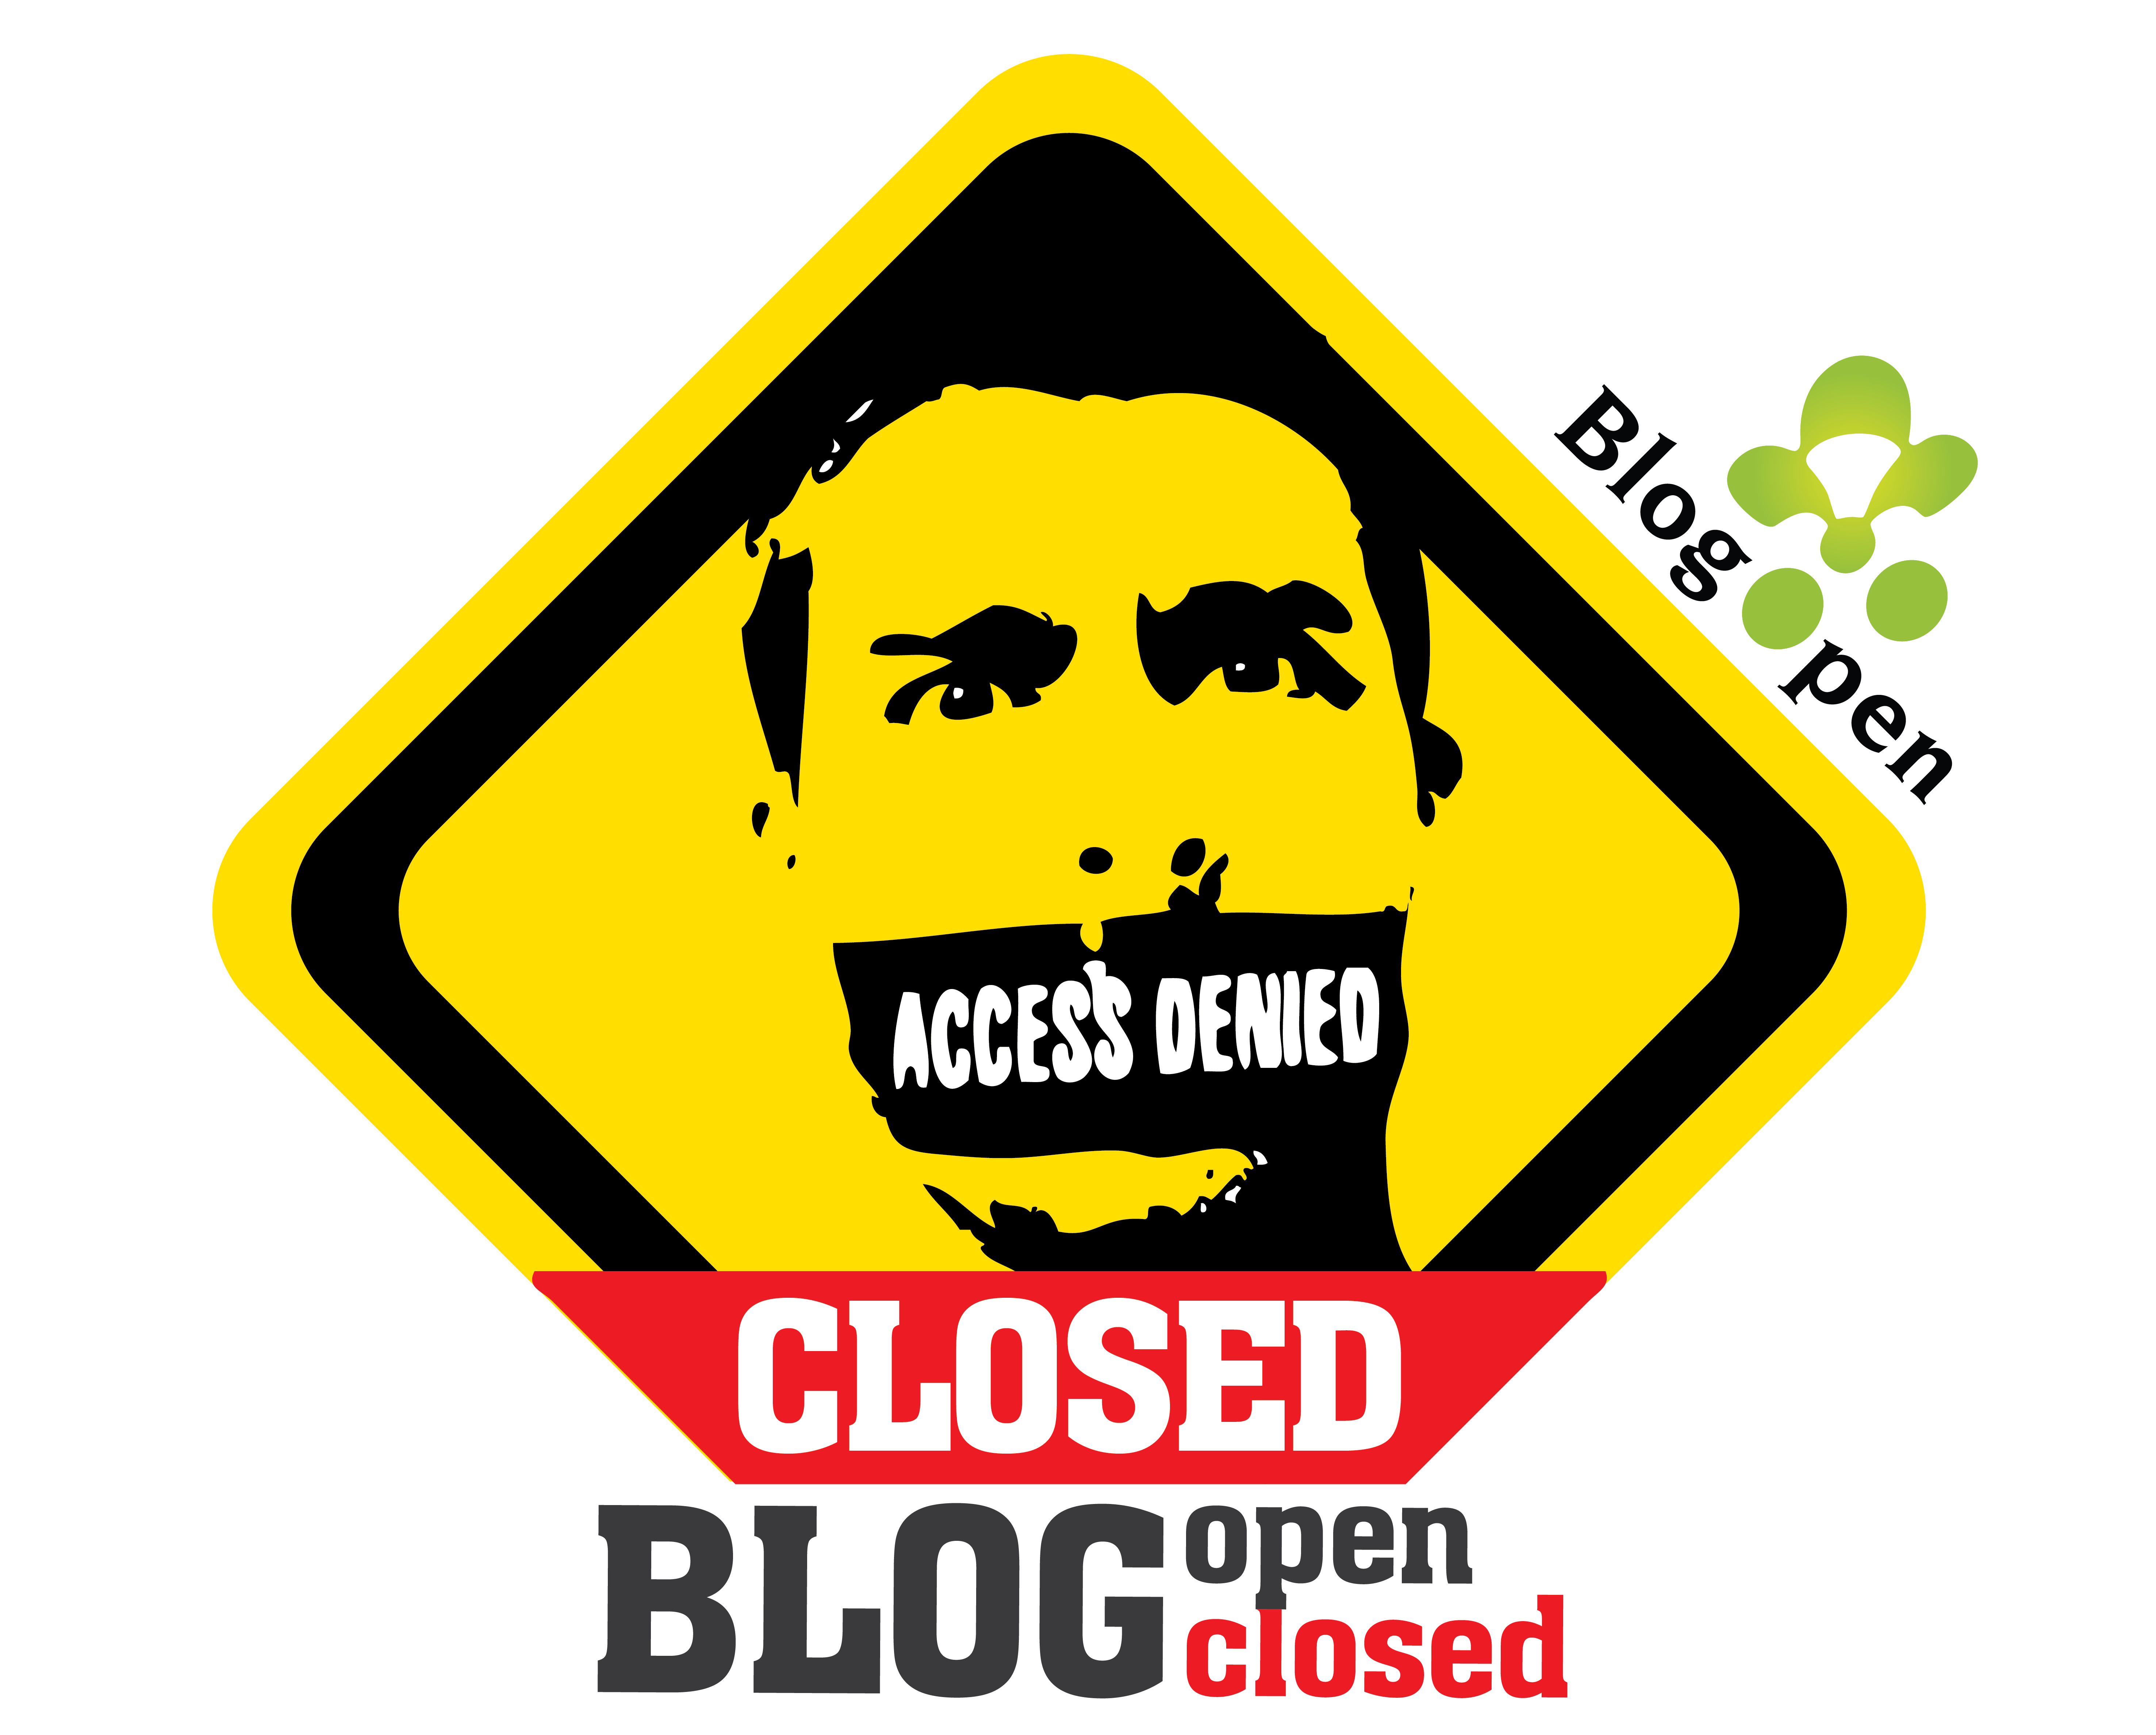 Blog open-Blog closed